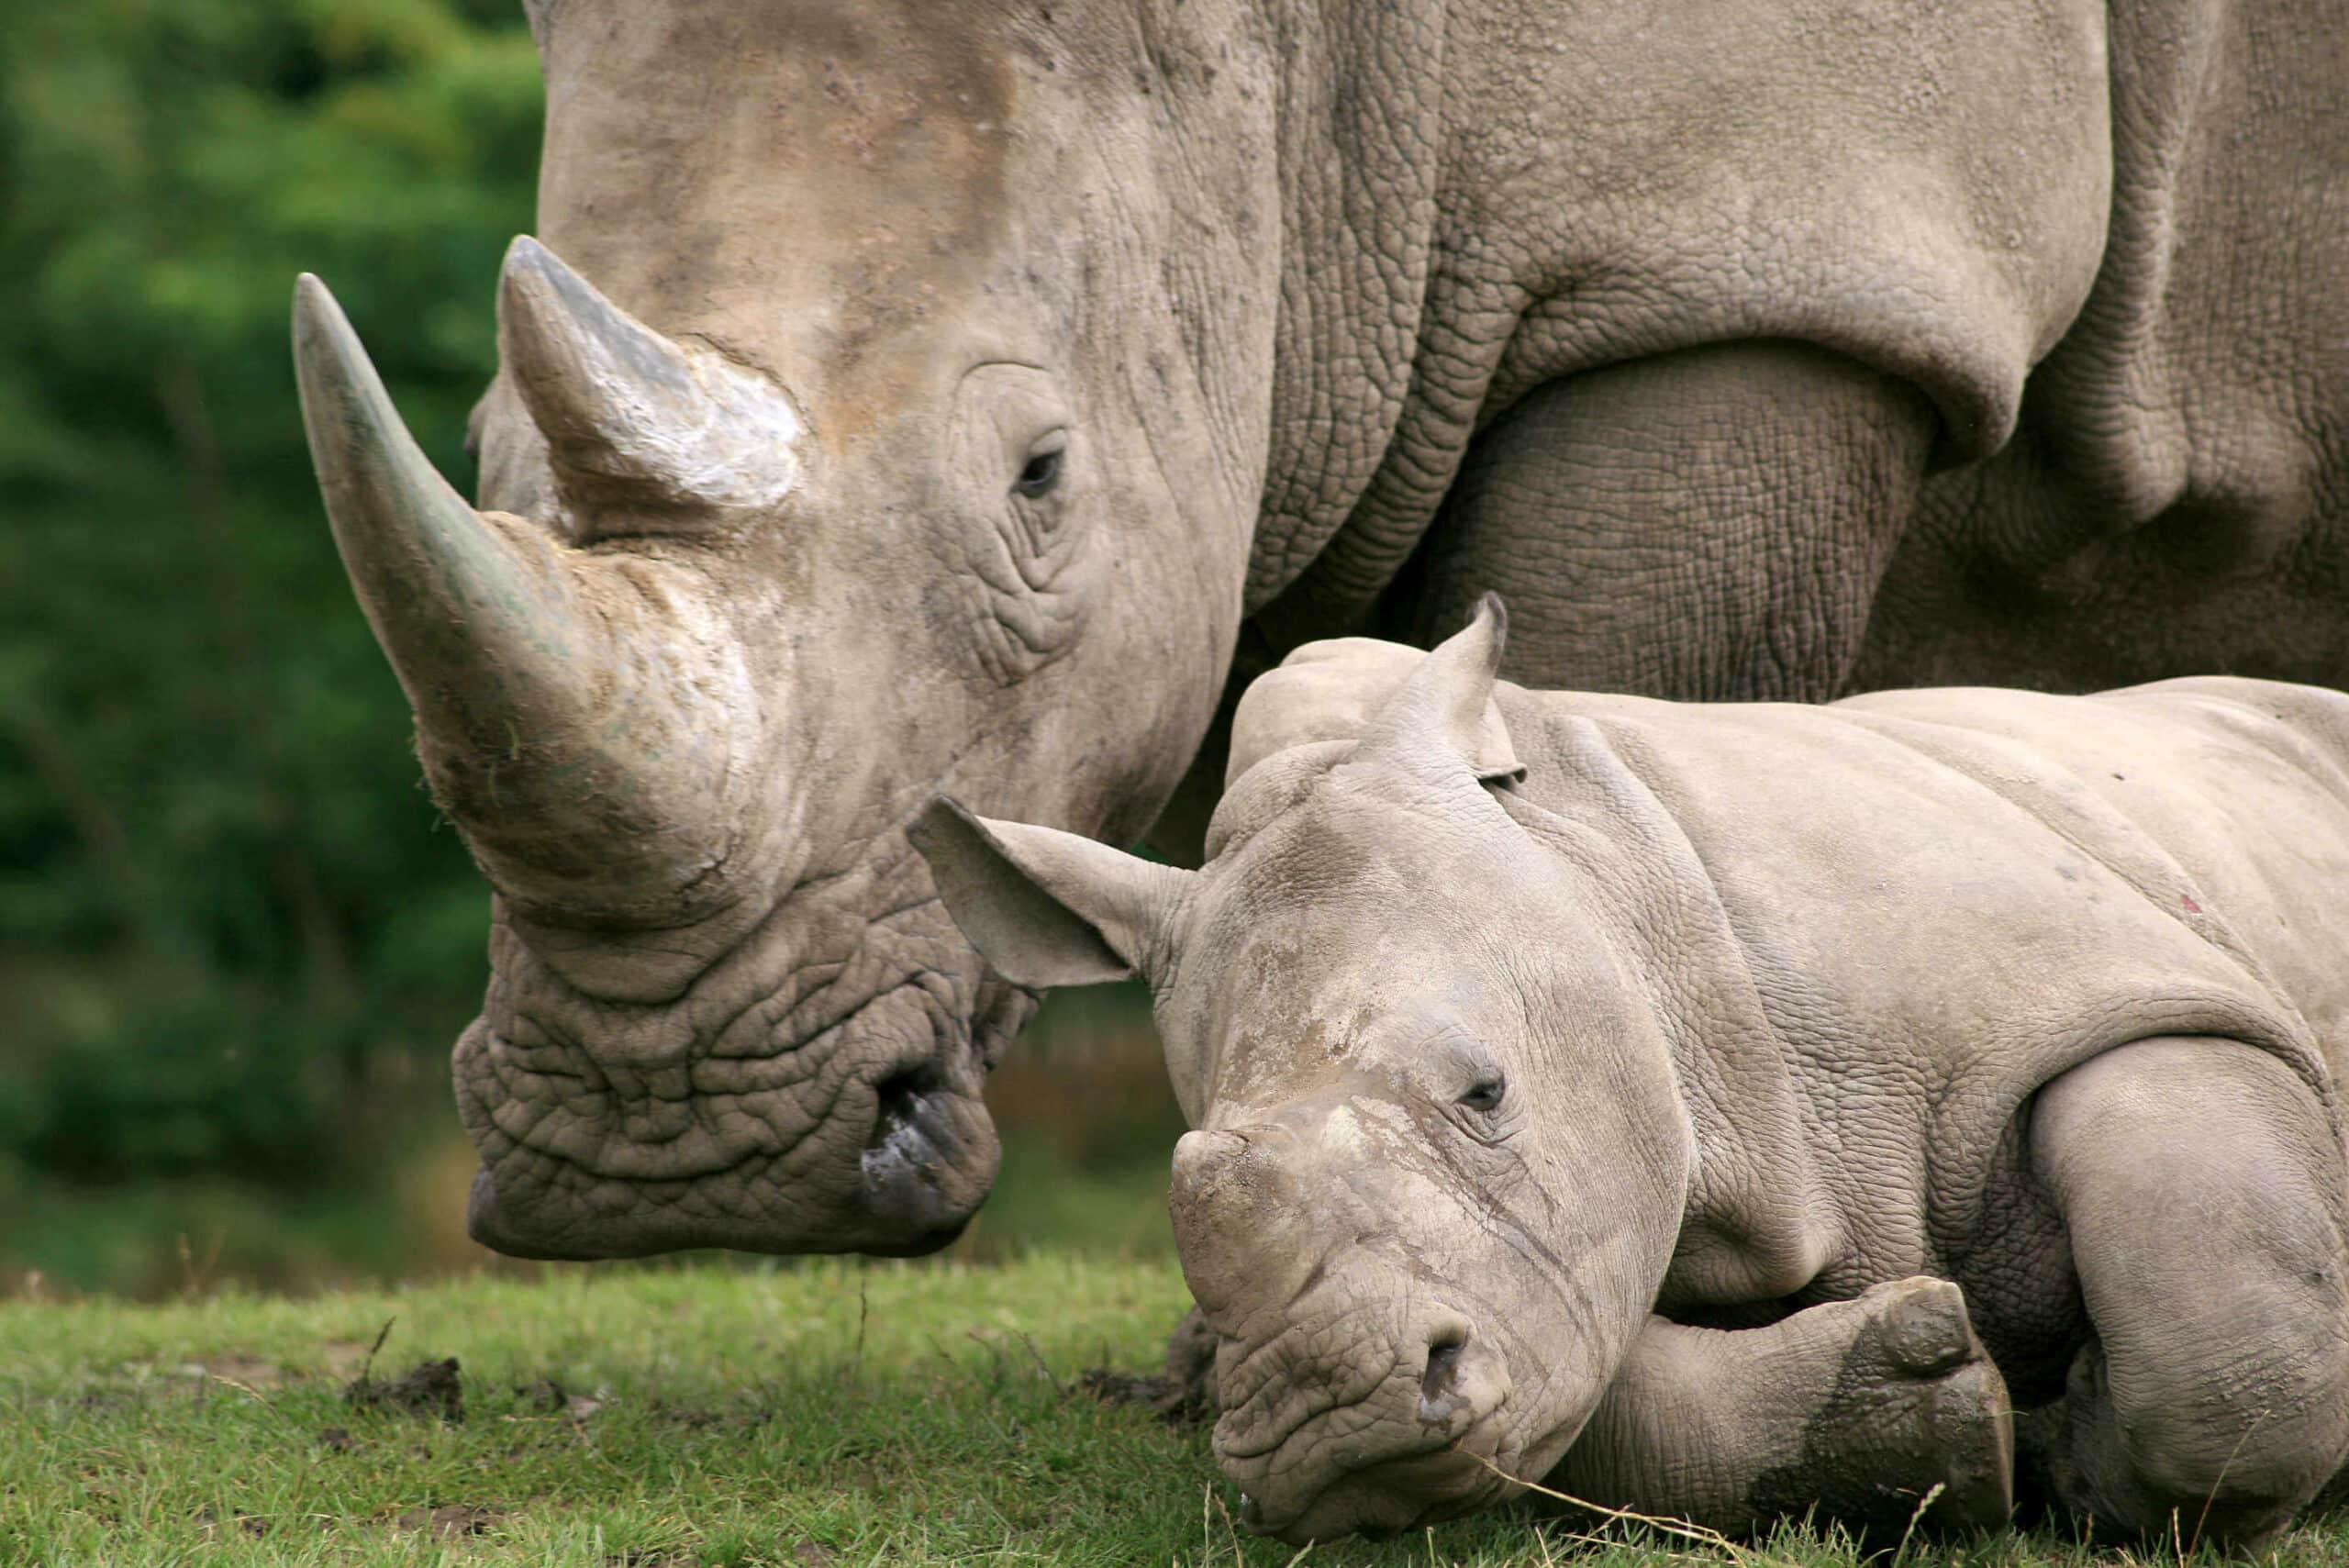 Südafrika Reisen – Wilderei an Nashörnern: Neue Zahlen aus Südafrika